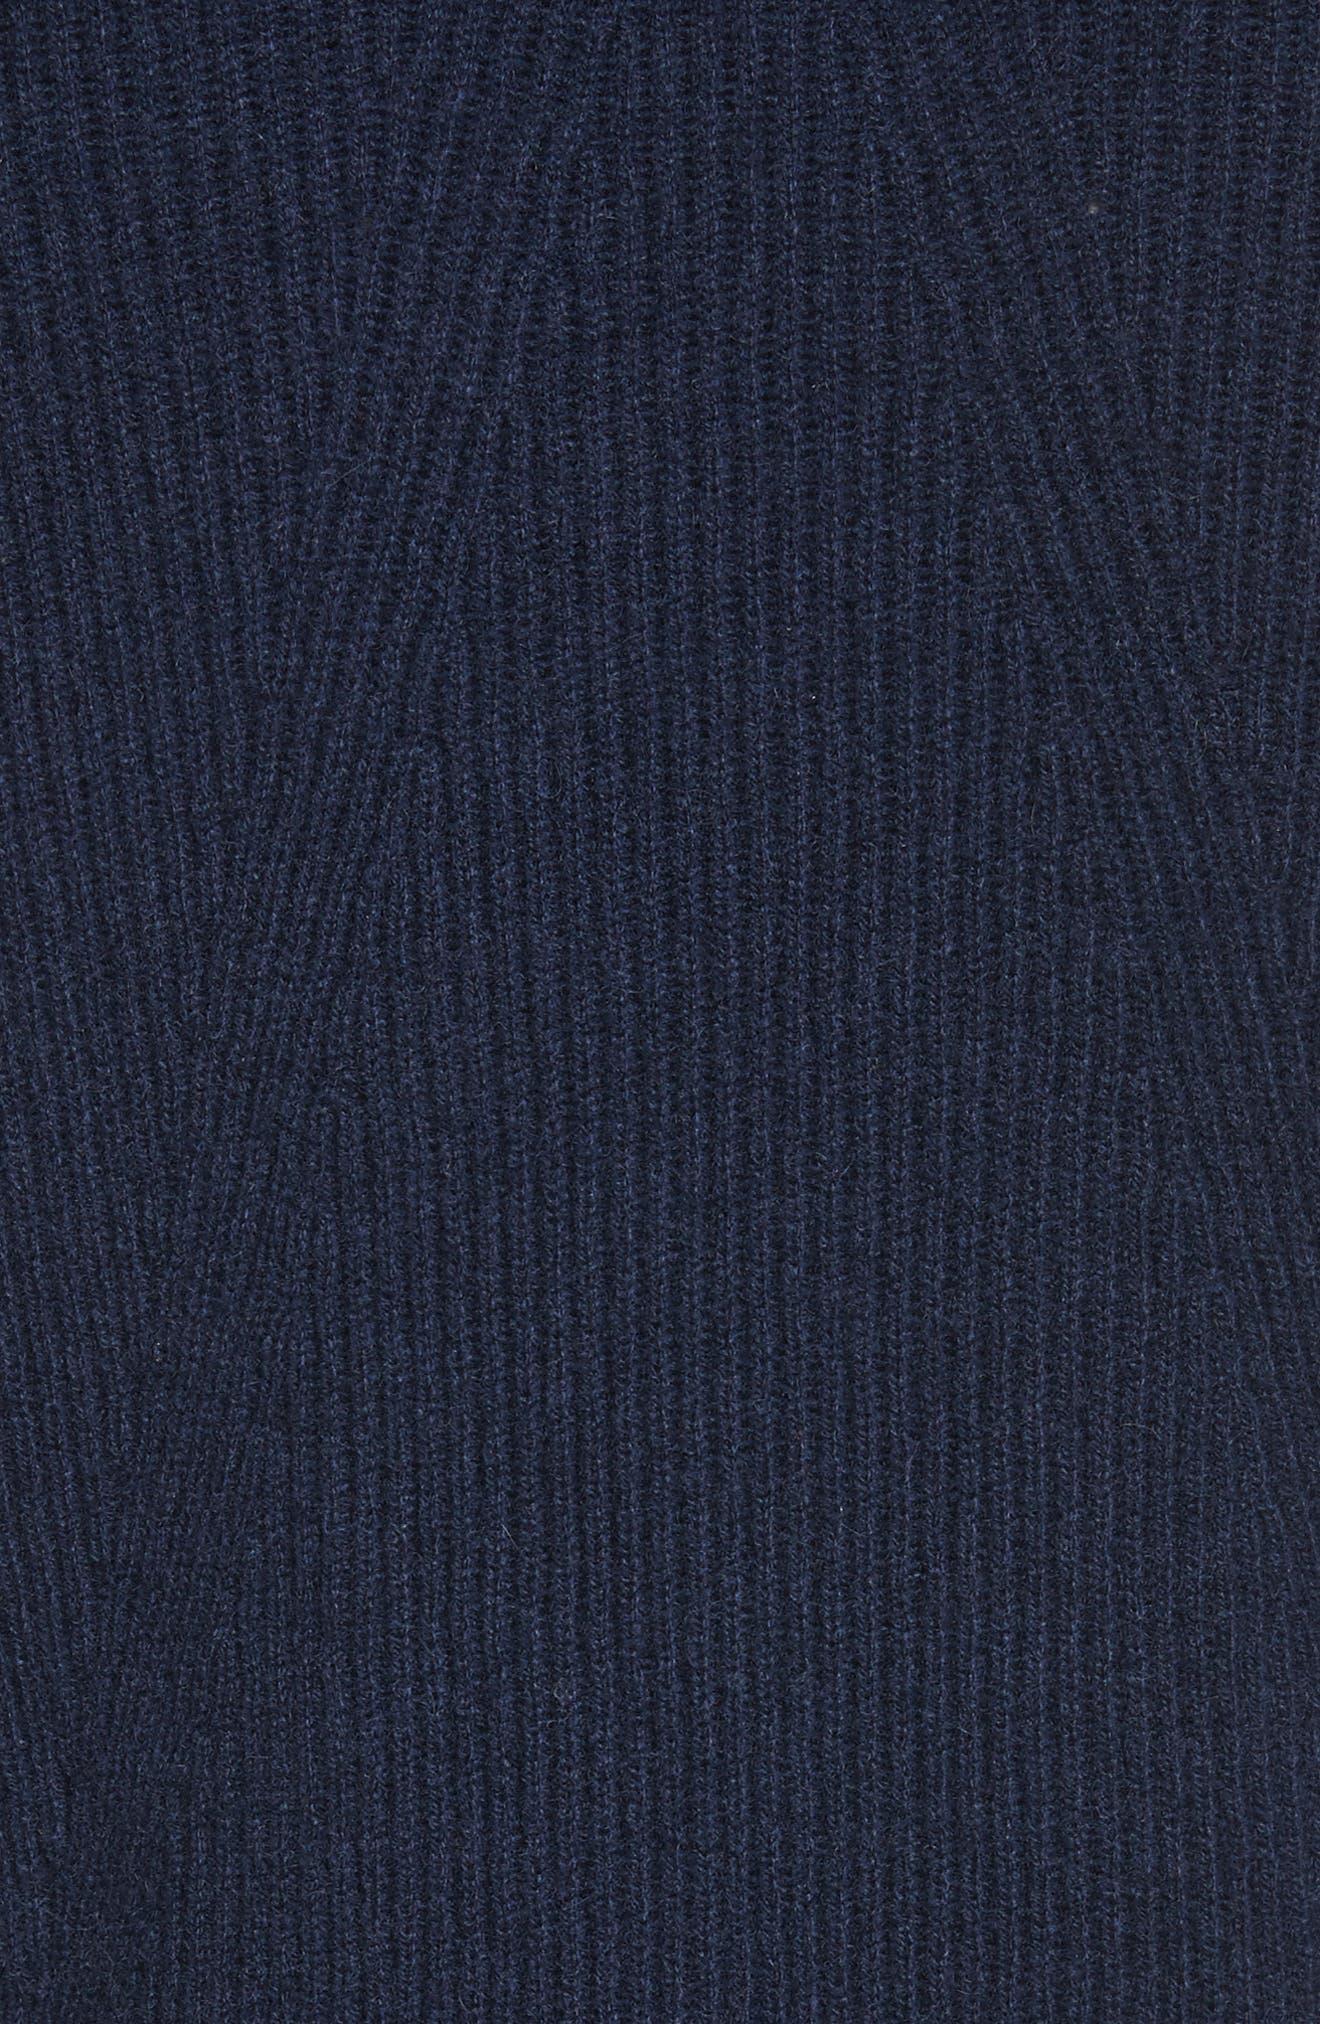 Ace Cashmere Crop Sweater,                             Alternate thumbnail 5, color,                             410